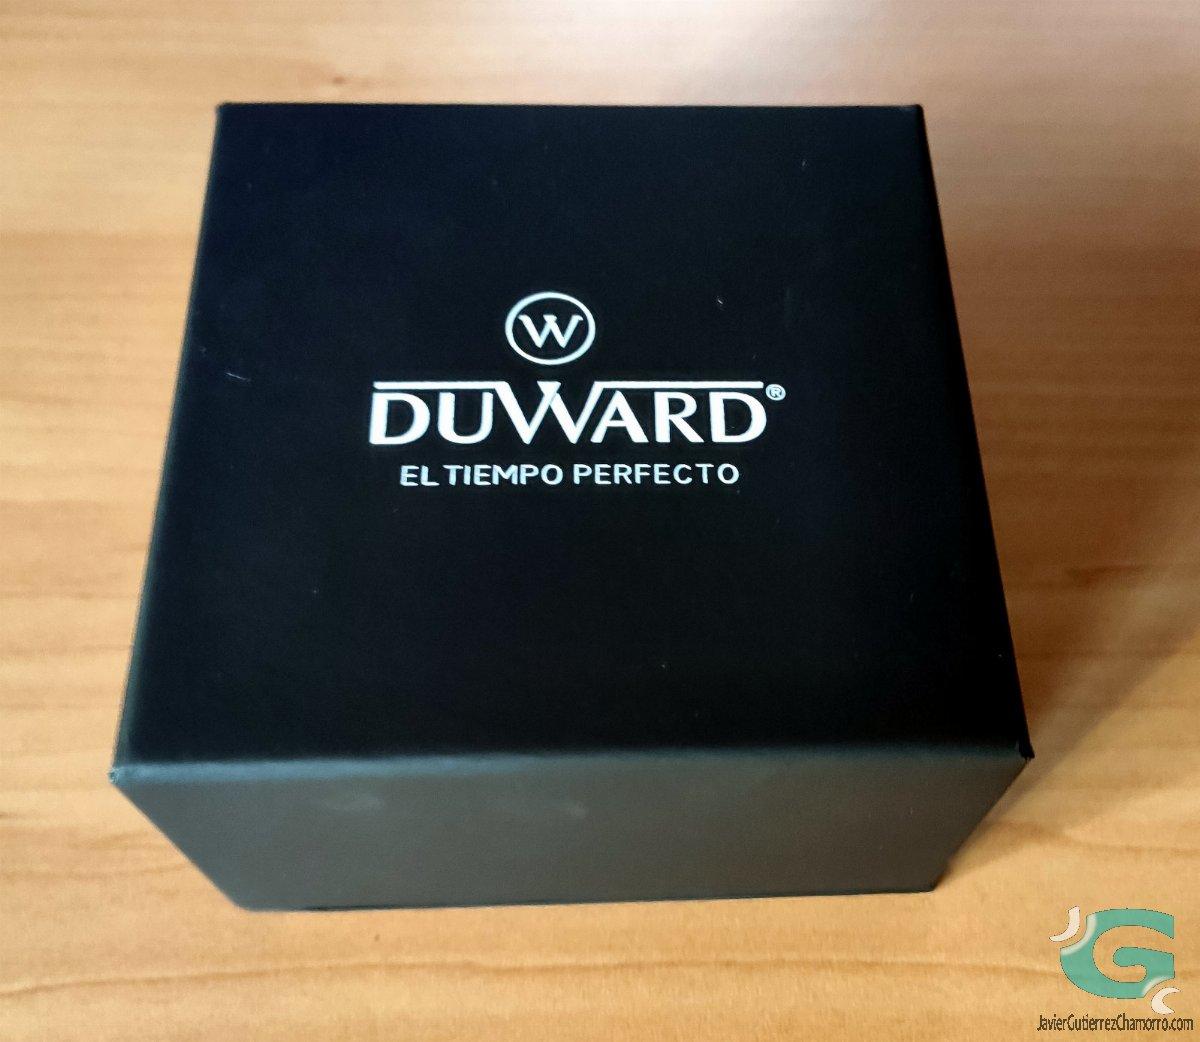 Duward Elegance Tyylikas